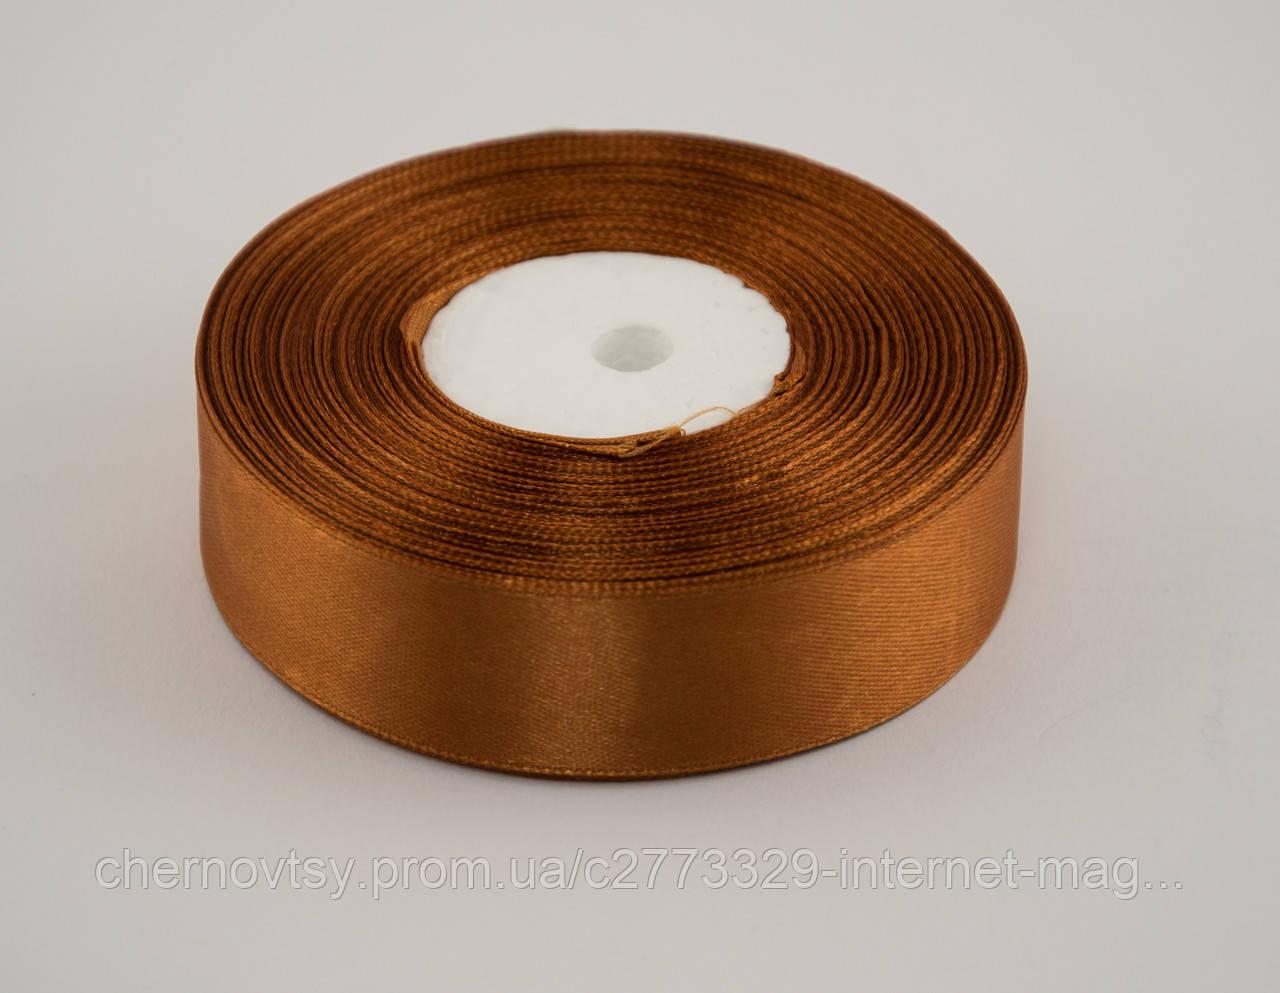 Стрічка атлас 0.9 см, 33 м, № 158 Темно-золотиста